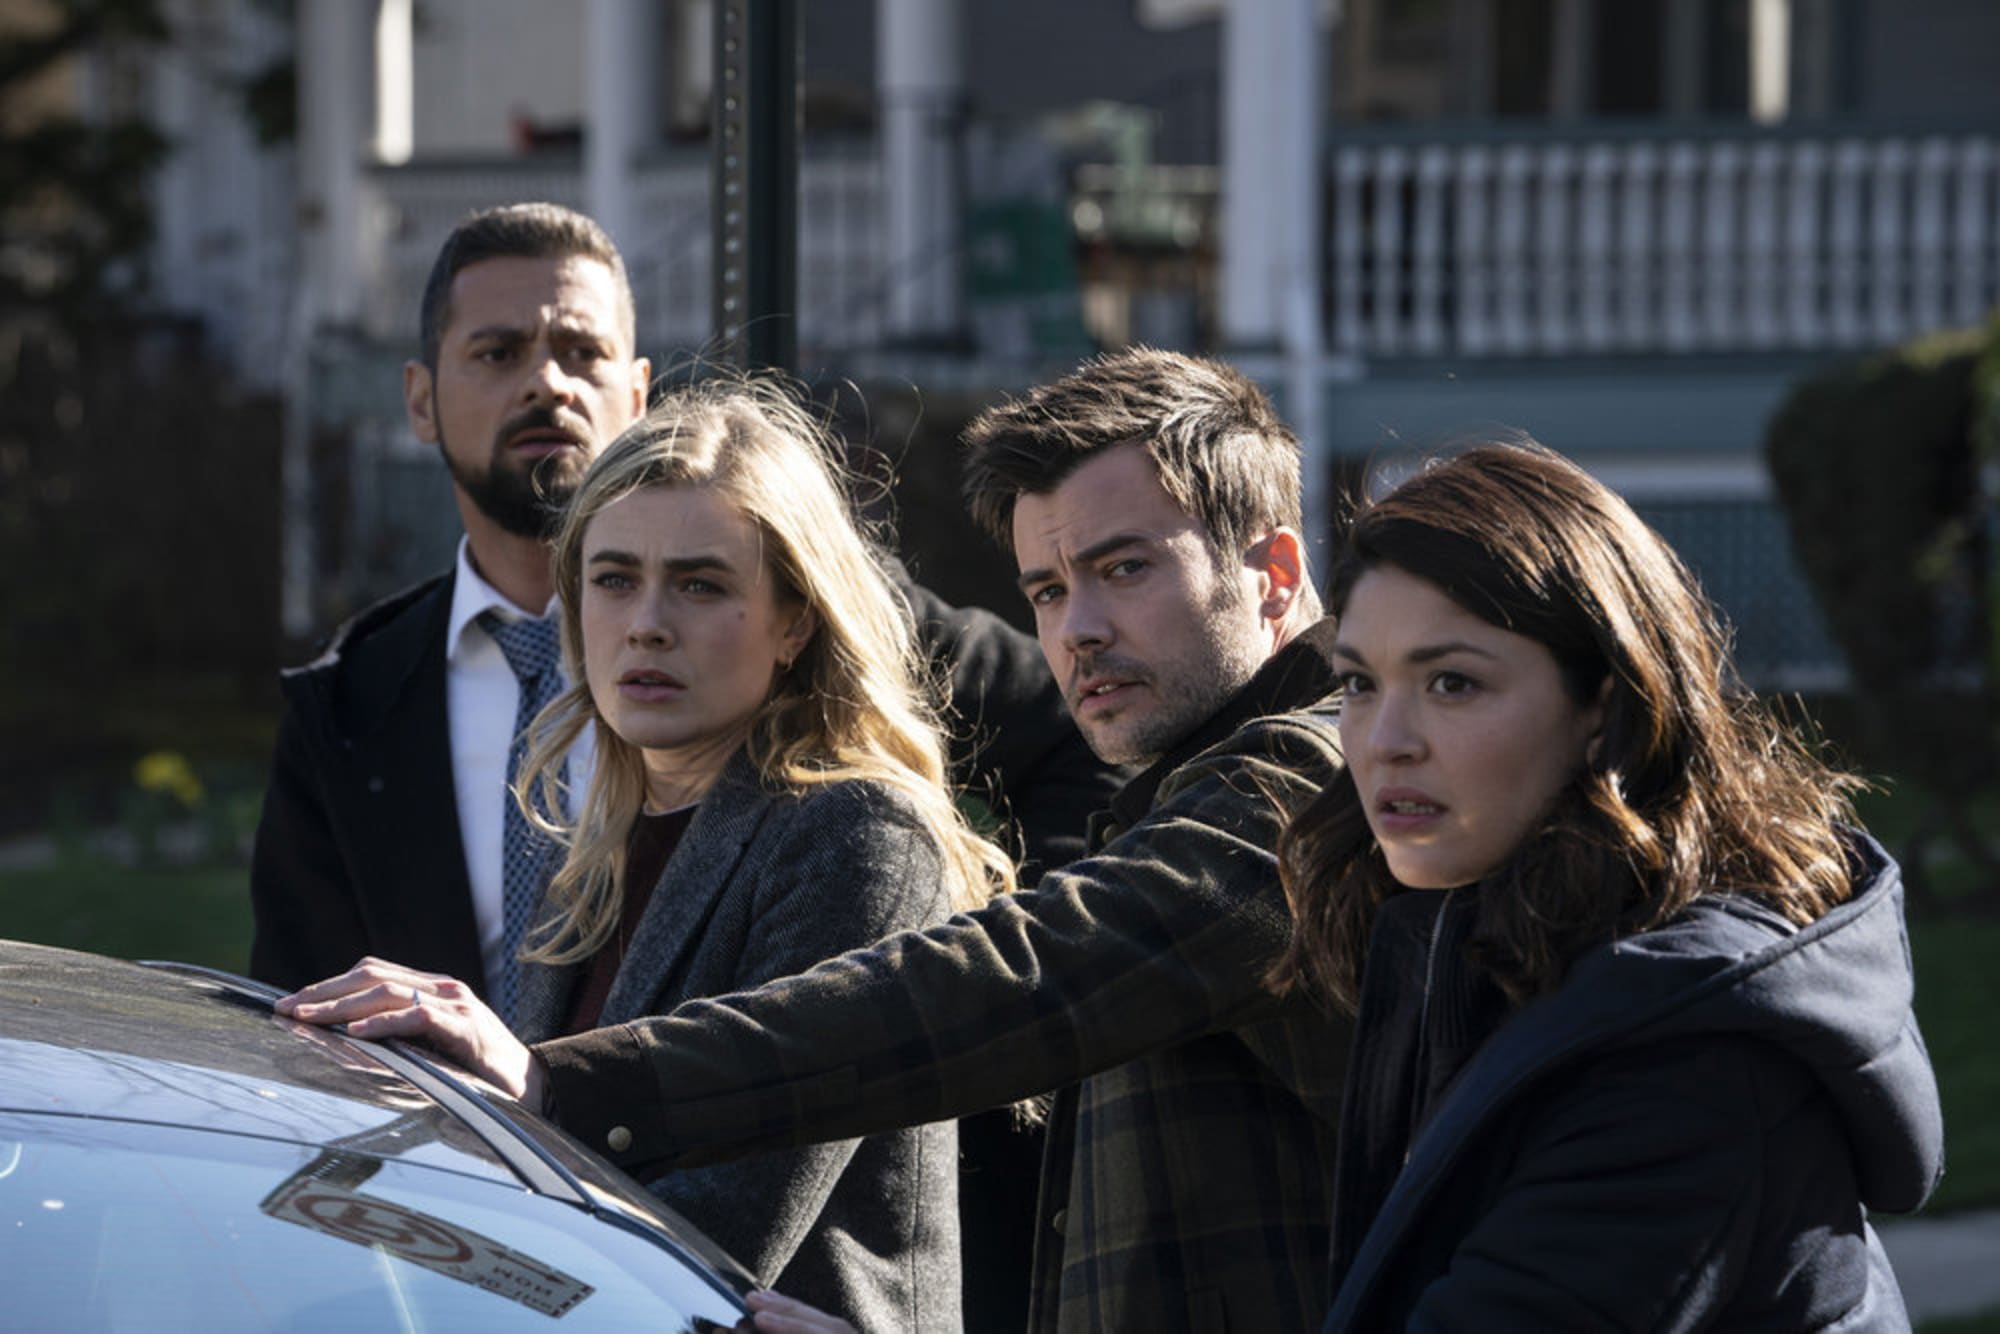 Manifest season 4: Netflix officially saves Manifest